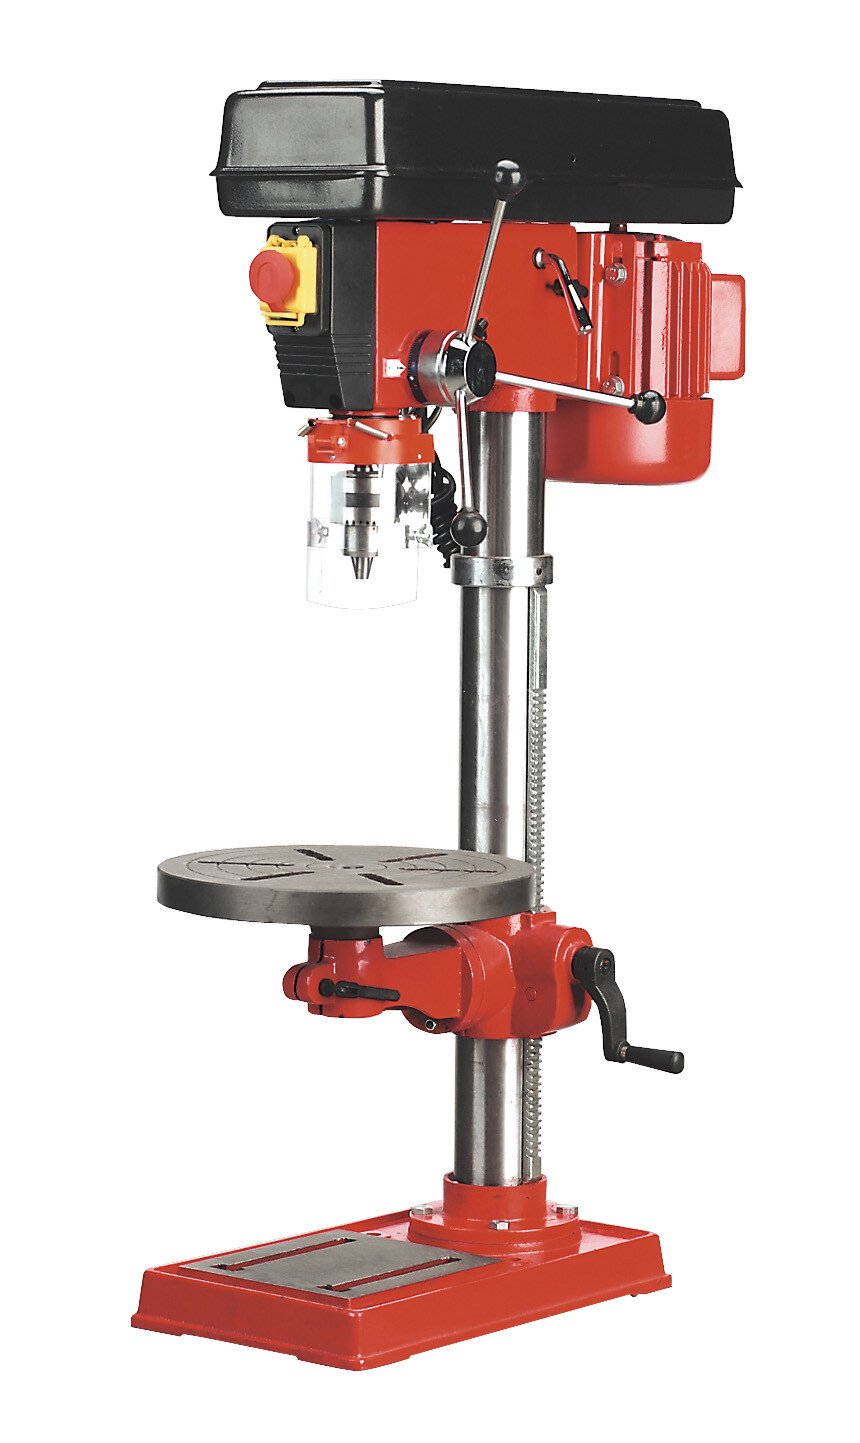 Sealey GDM120B 16 Speed Bench Pillar Drill Press GDM120B